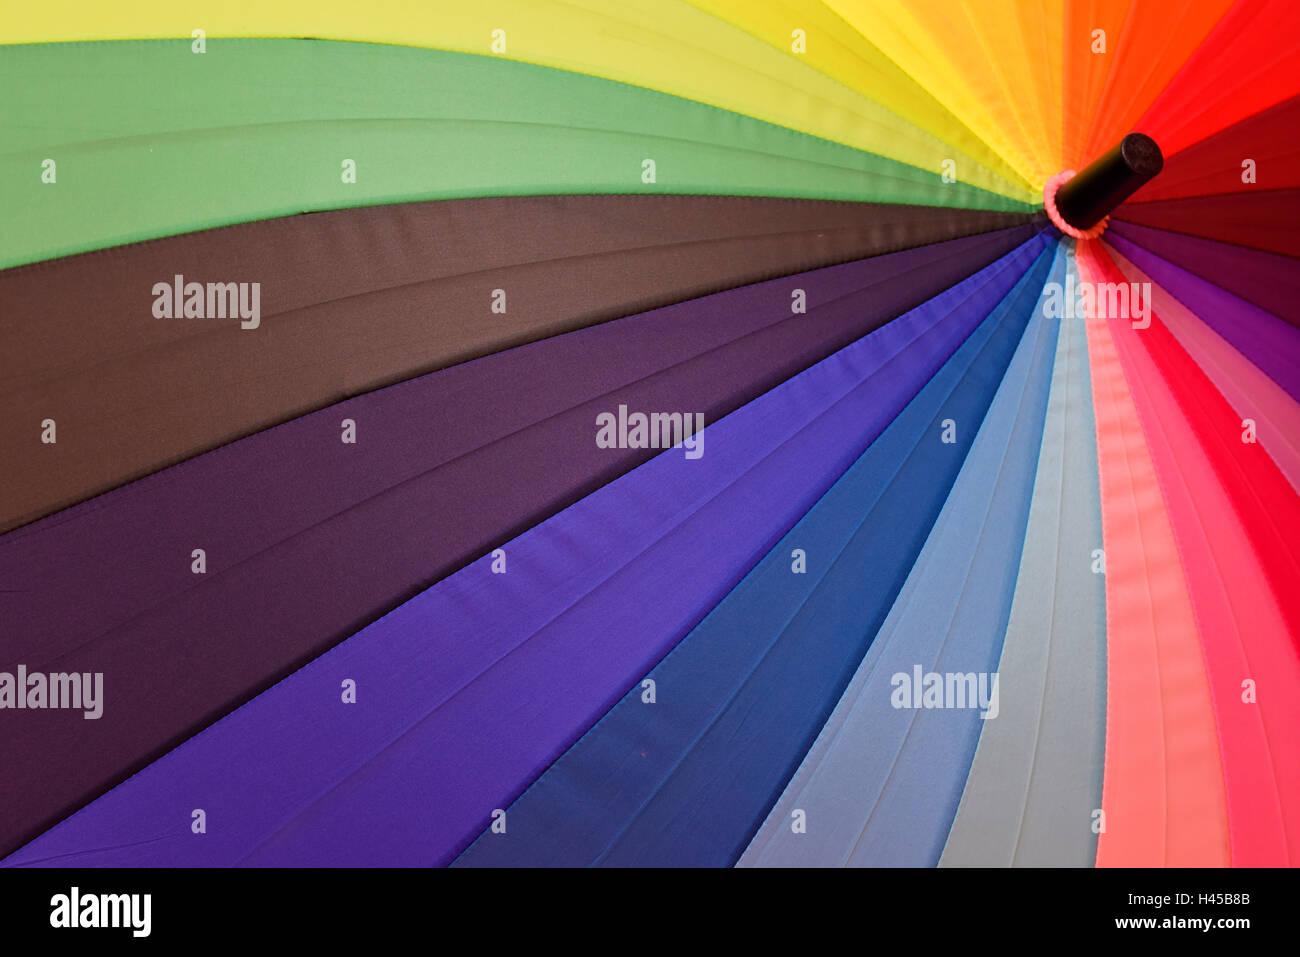 Bright umbrella with rainbow colors close-up Stock Photo